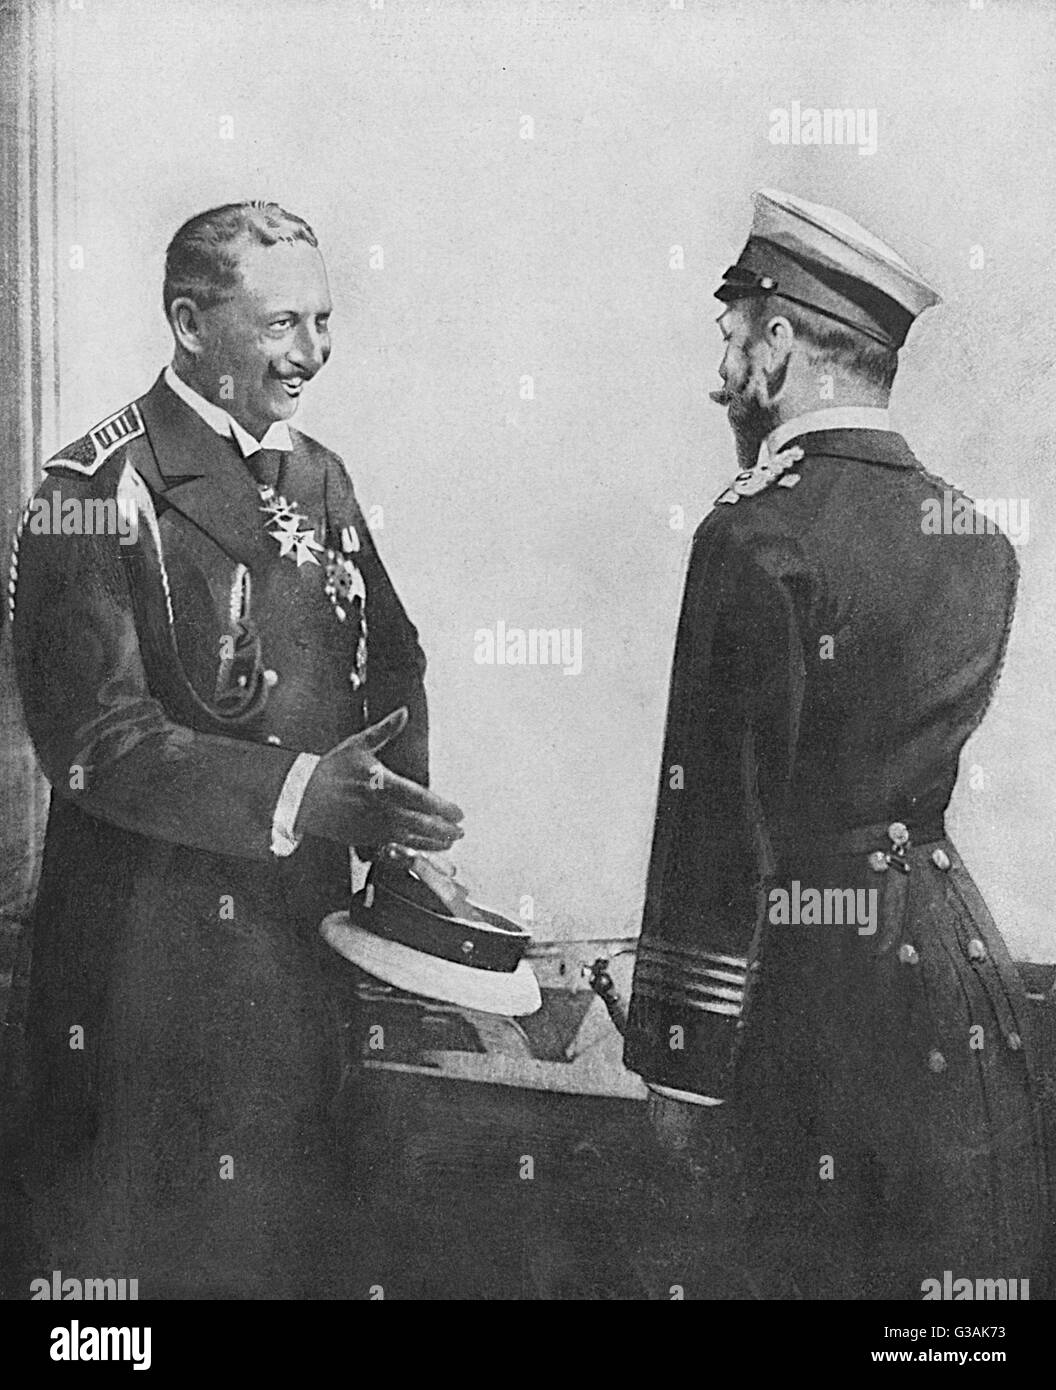 Meeting between Kaiser Wilhelm II of Germany and Tsar Nicholas II of Russia.     Date: c. 1900 Stock Photo